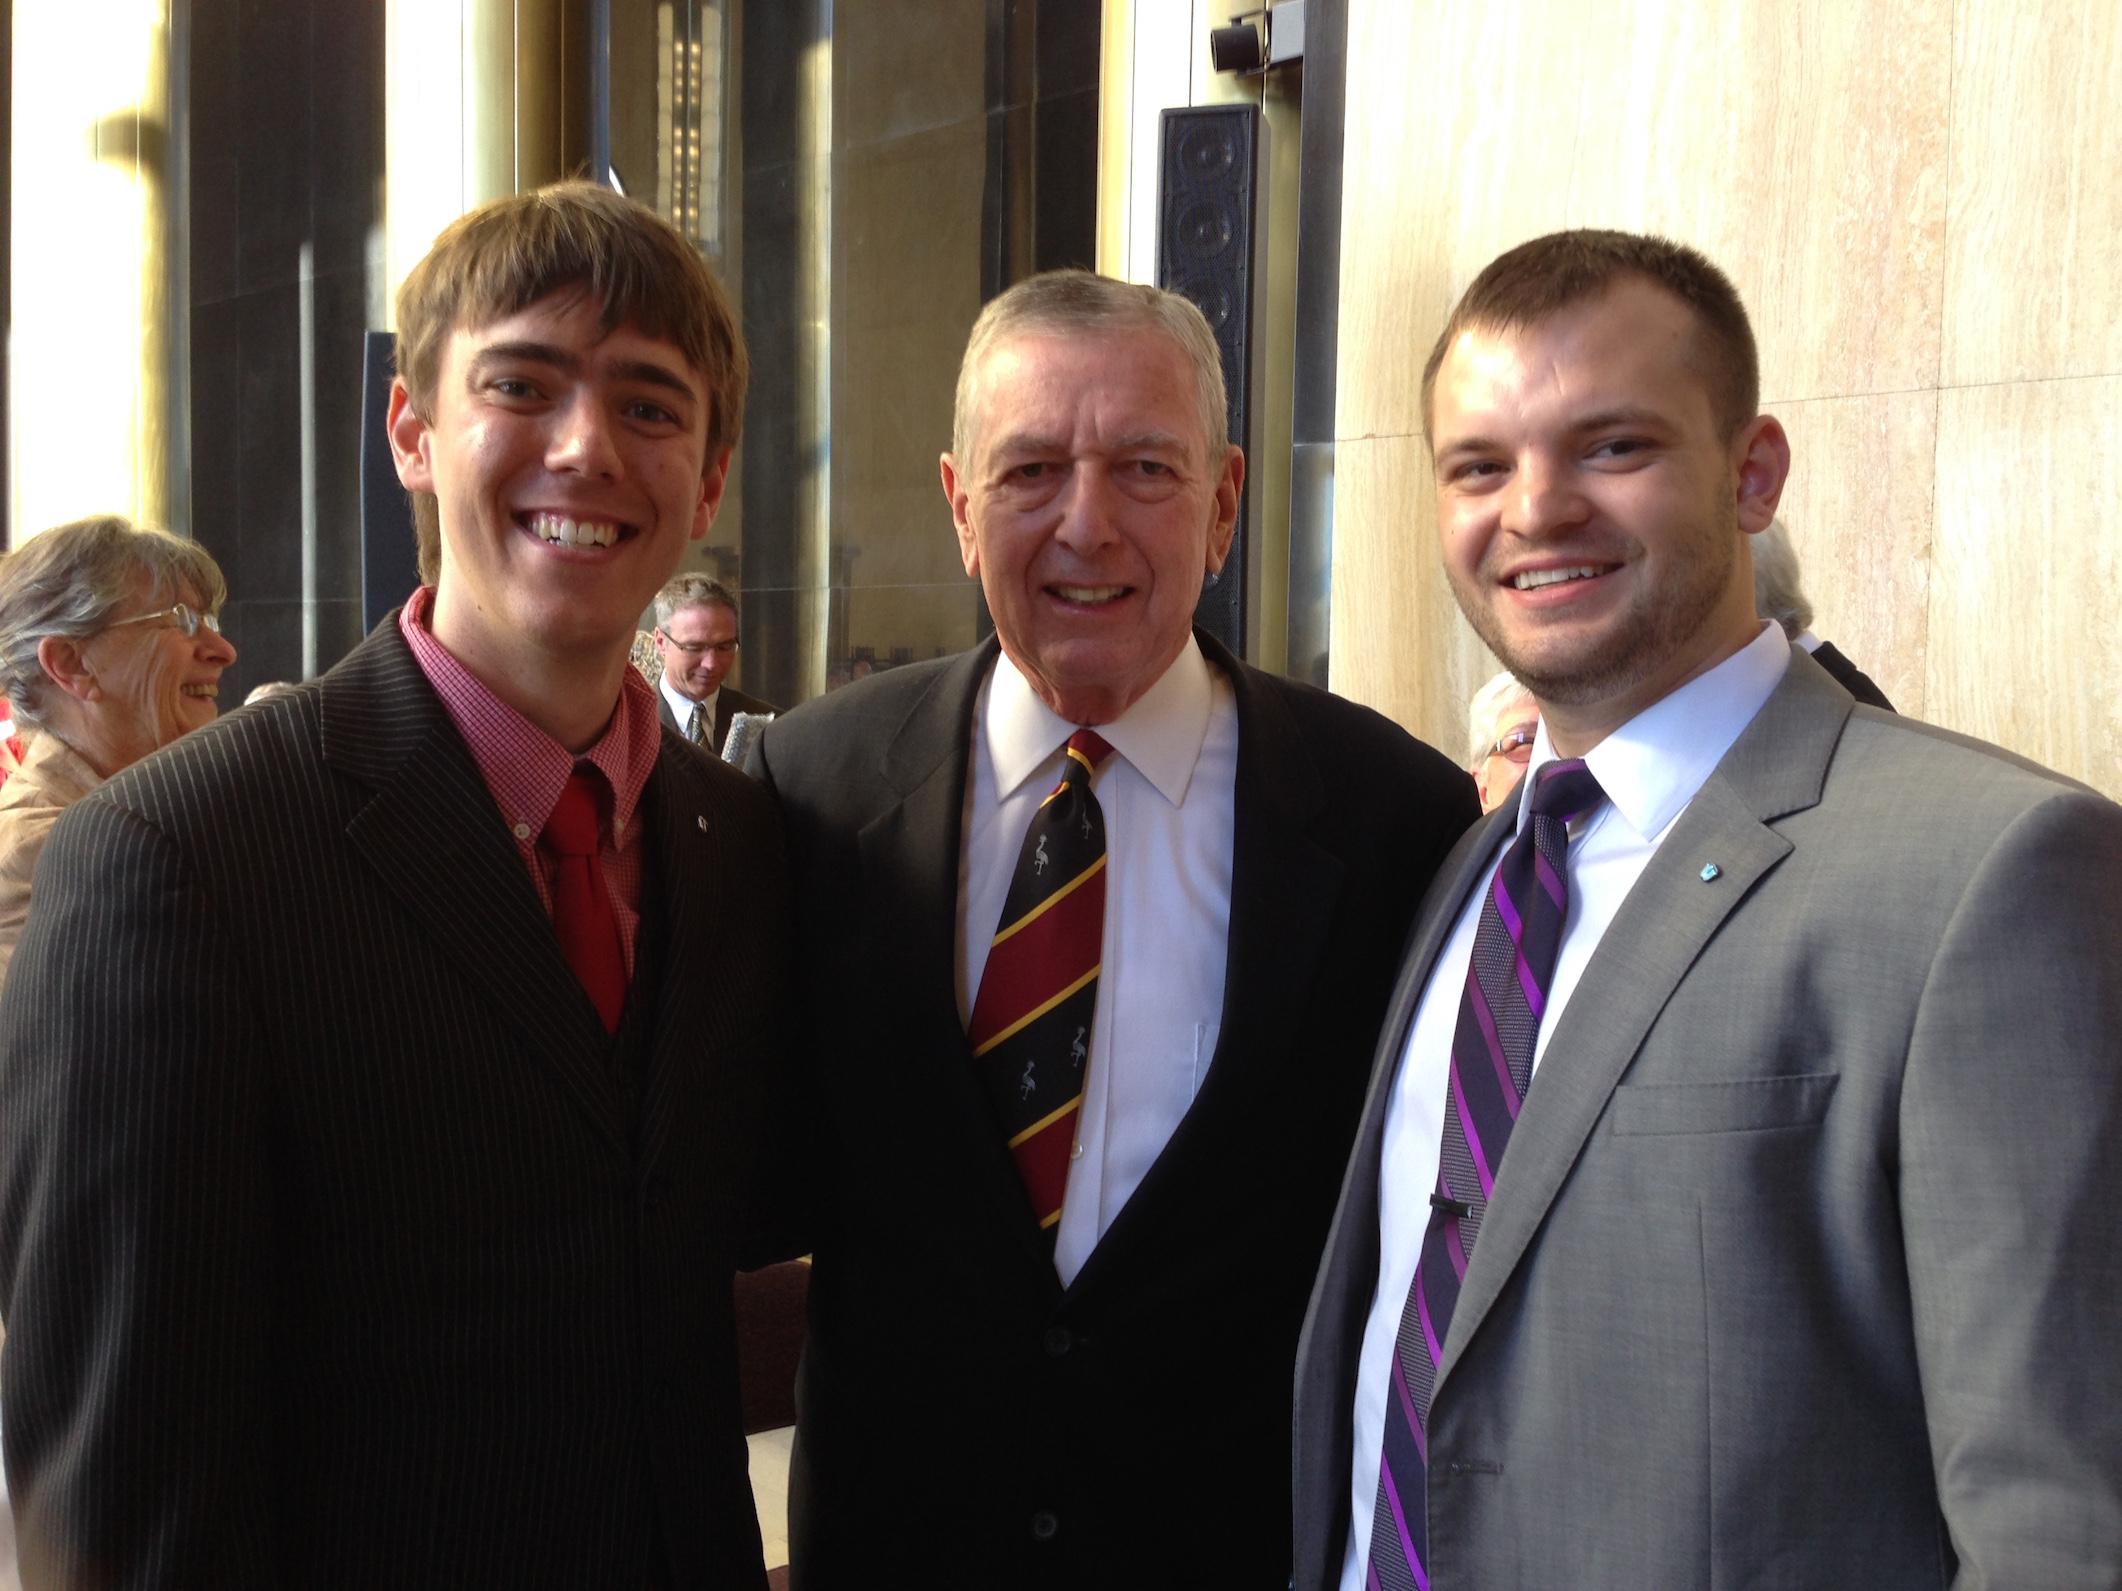 From Left to Right: NDRL Legislative Director Brock Schmeling, Former US Attorney General John Ashcroft, NDRL Executive Director Devyn Nelson.